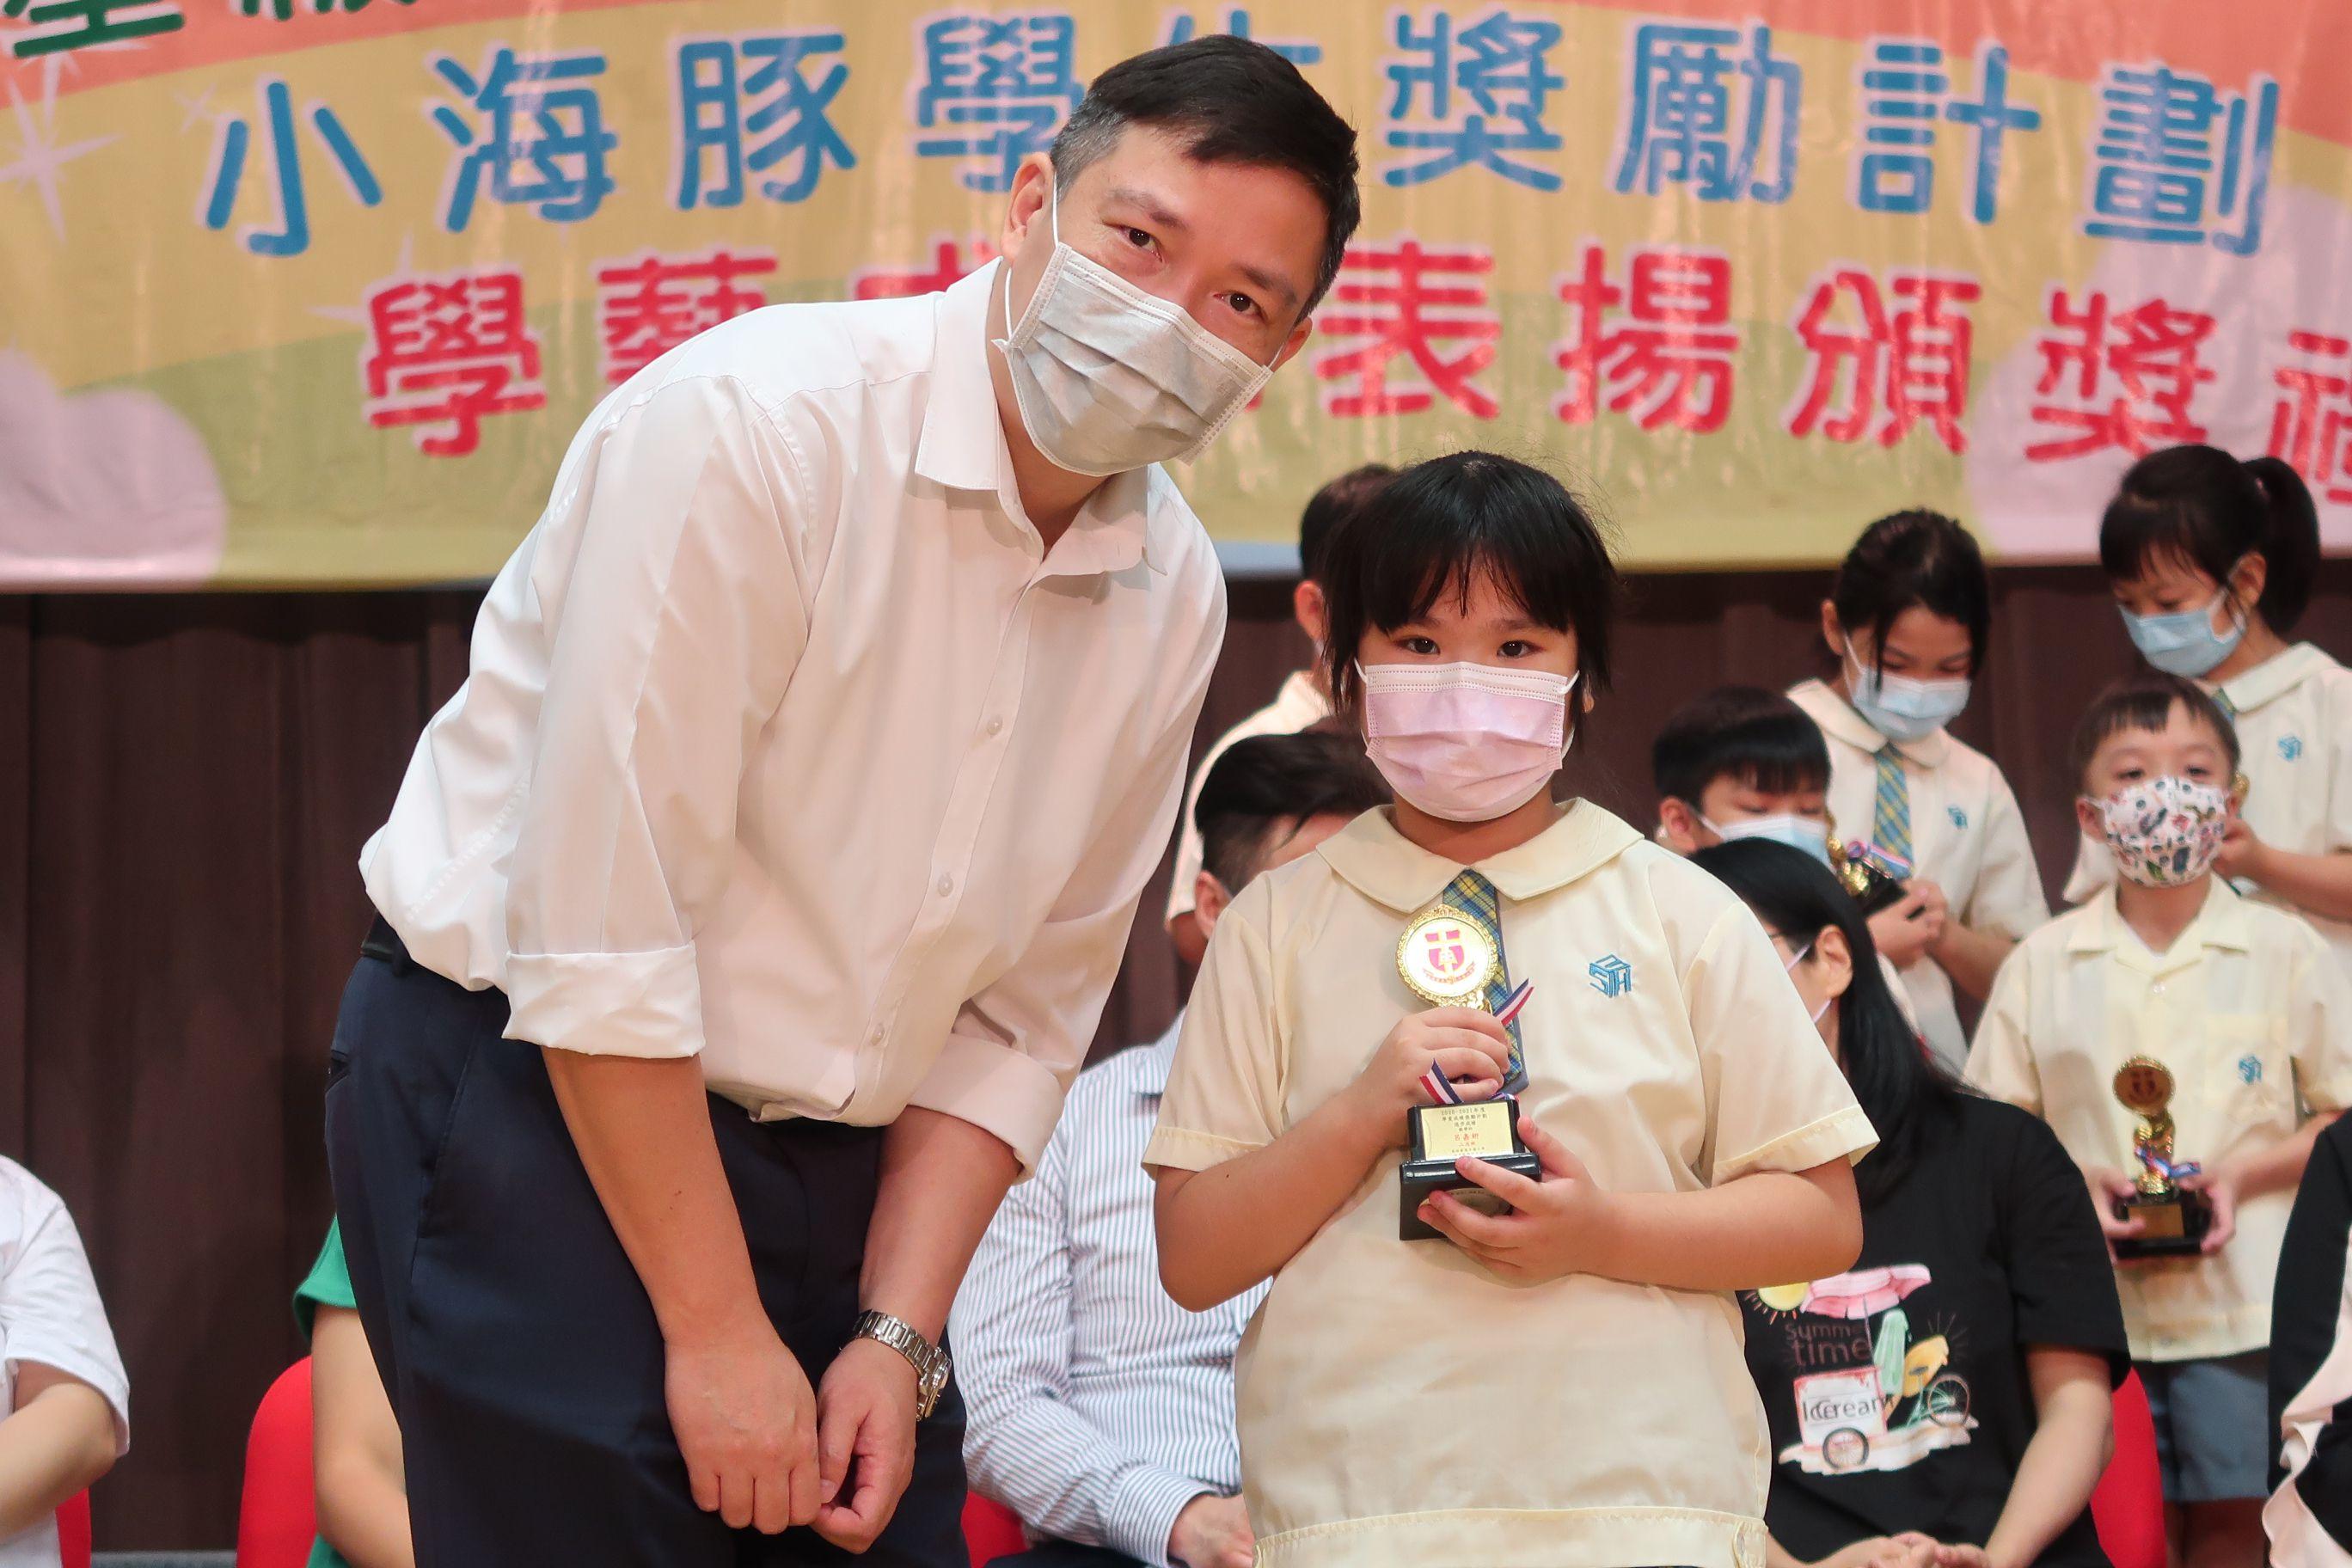 https://syh.edu.hk/sites/default/files/img_5664.jpg